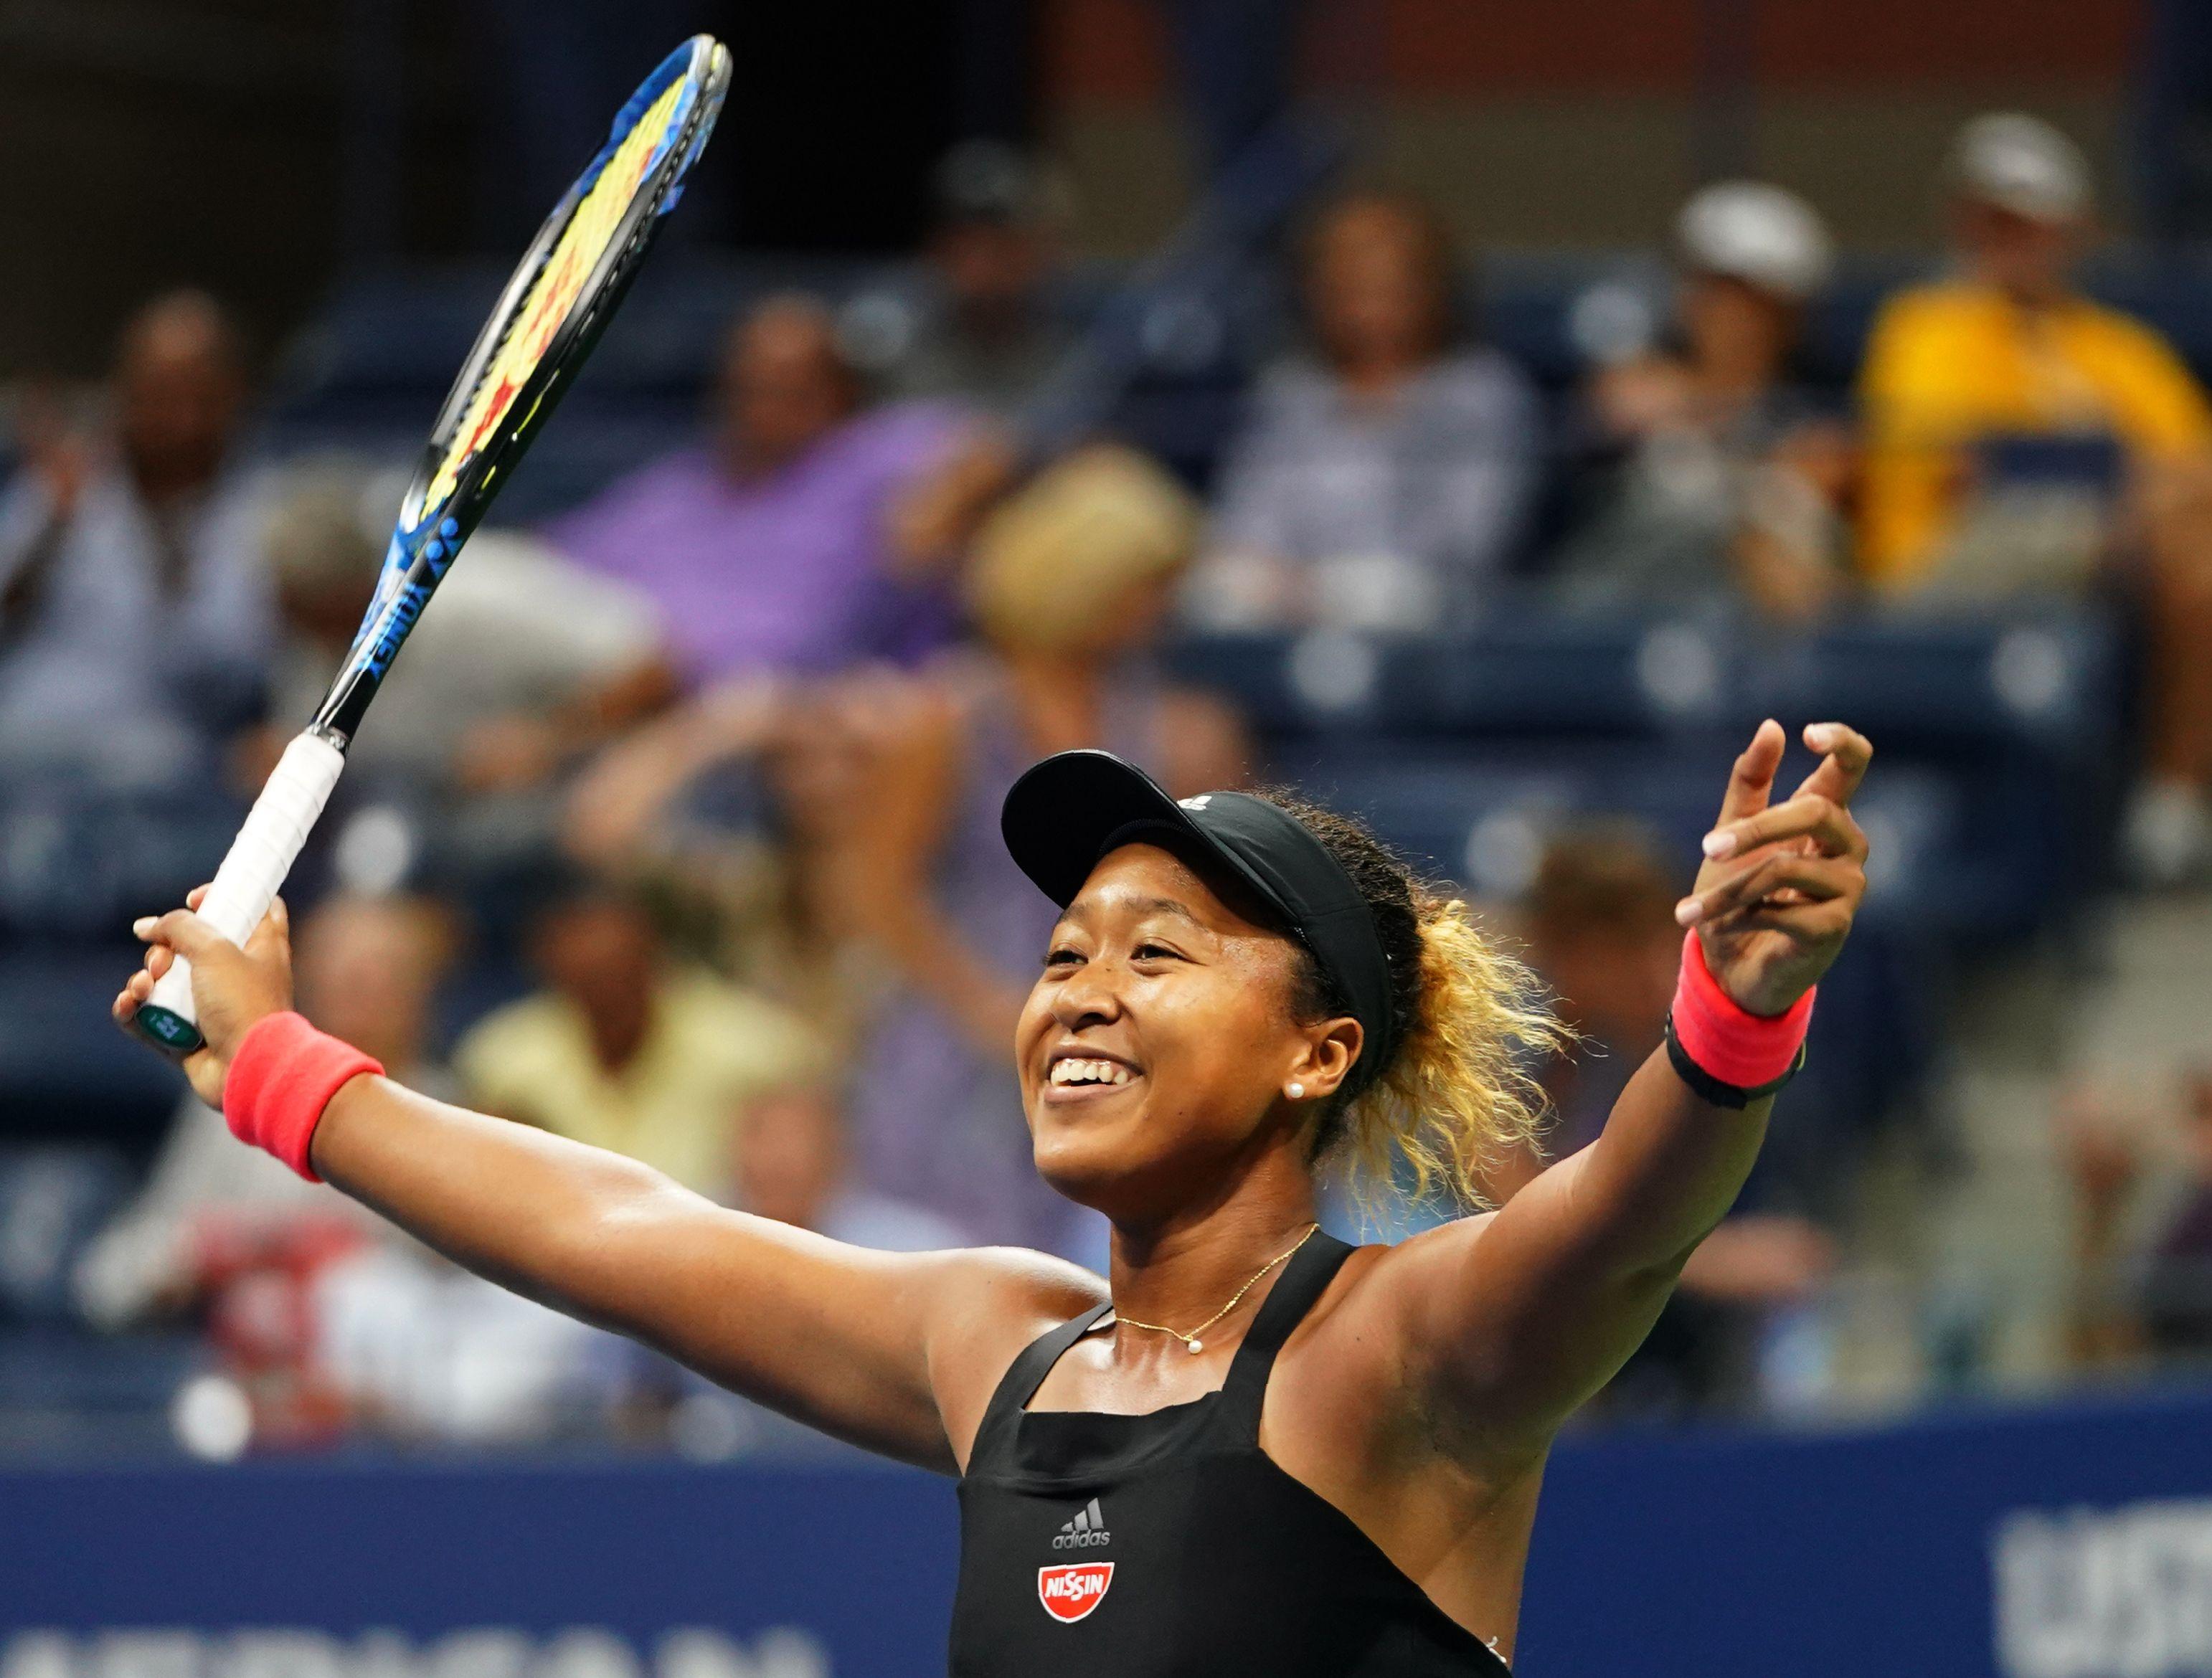 Osaka beat American 14th seed Madison Keys 6-2 6-4 to reach her first Grand Slam final